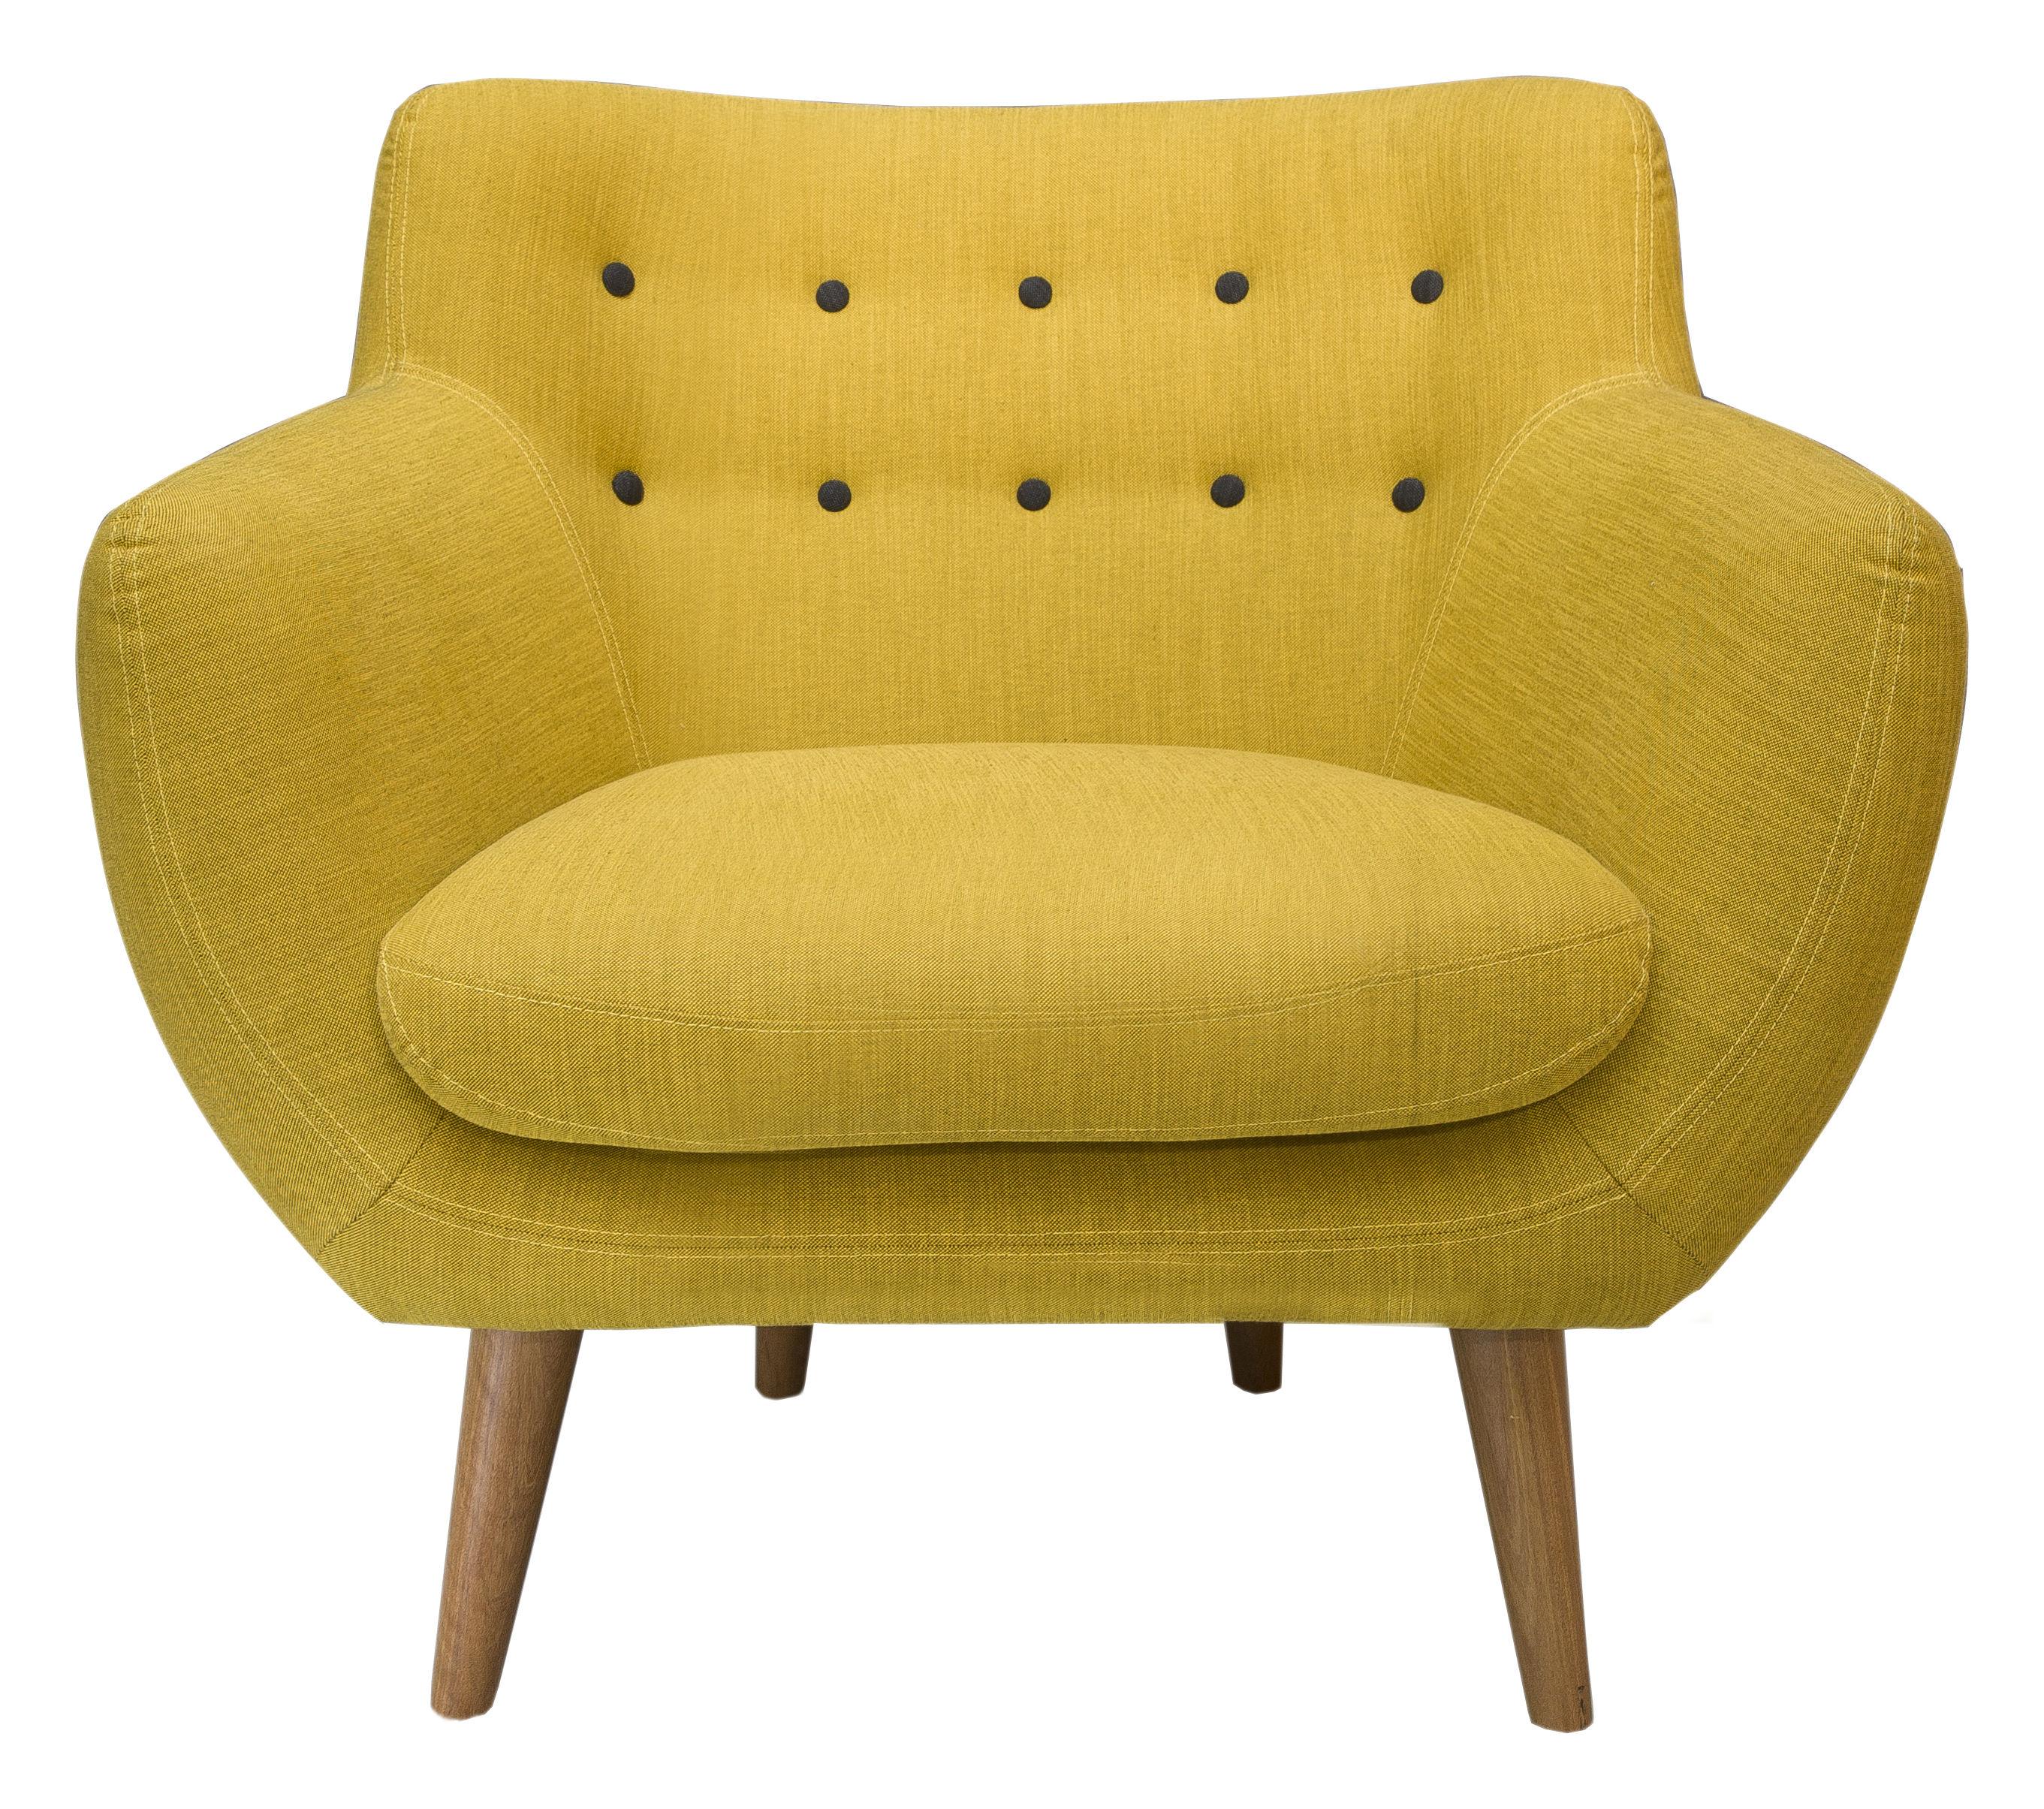 Möbel - Lounge Sessel - Coogee Gepolsterter Sessel - Sentou Edition - Zitronengelb / pechschwarz - Gewebe, Holz, Schaumstoff